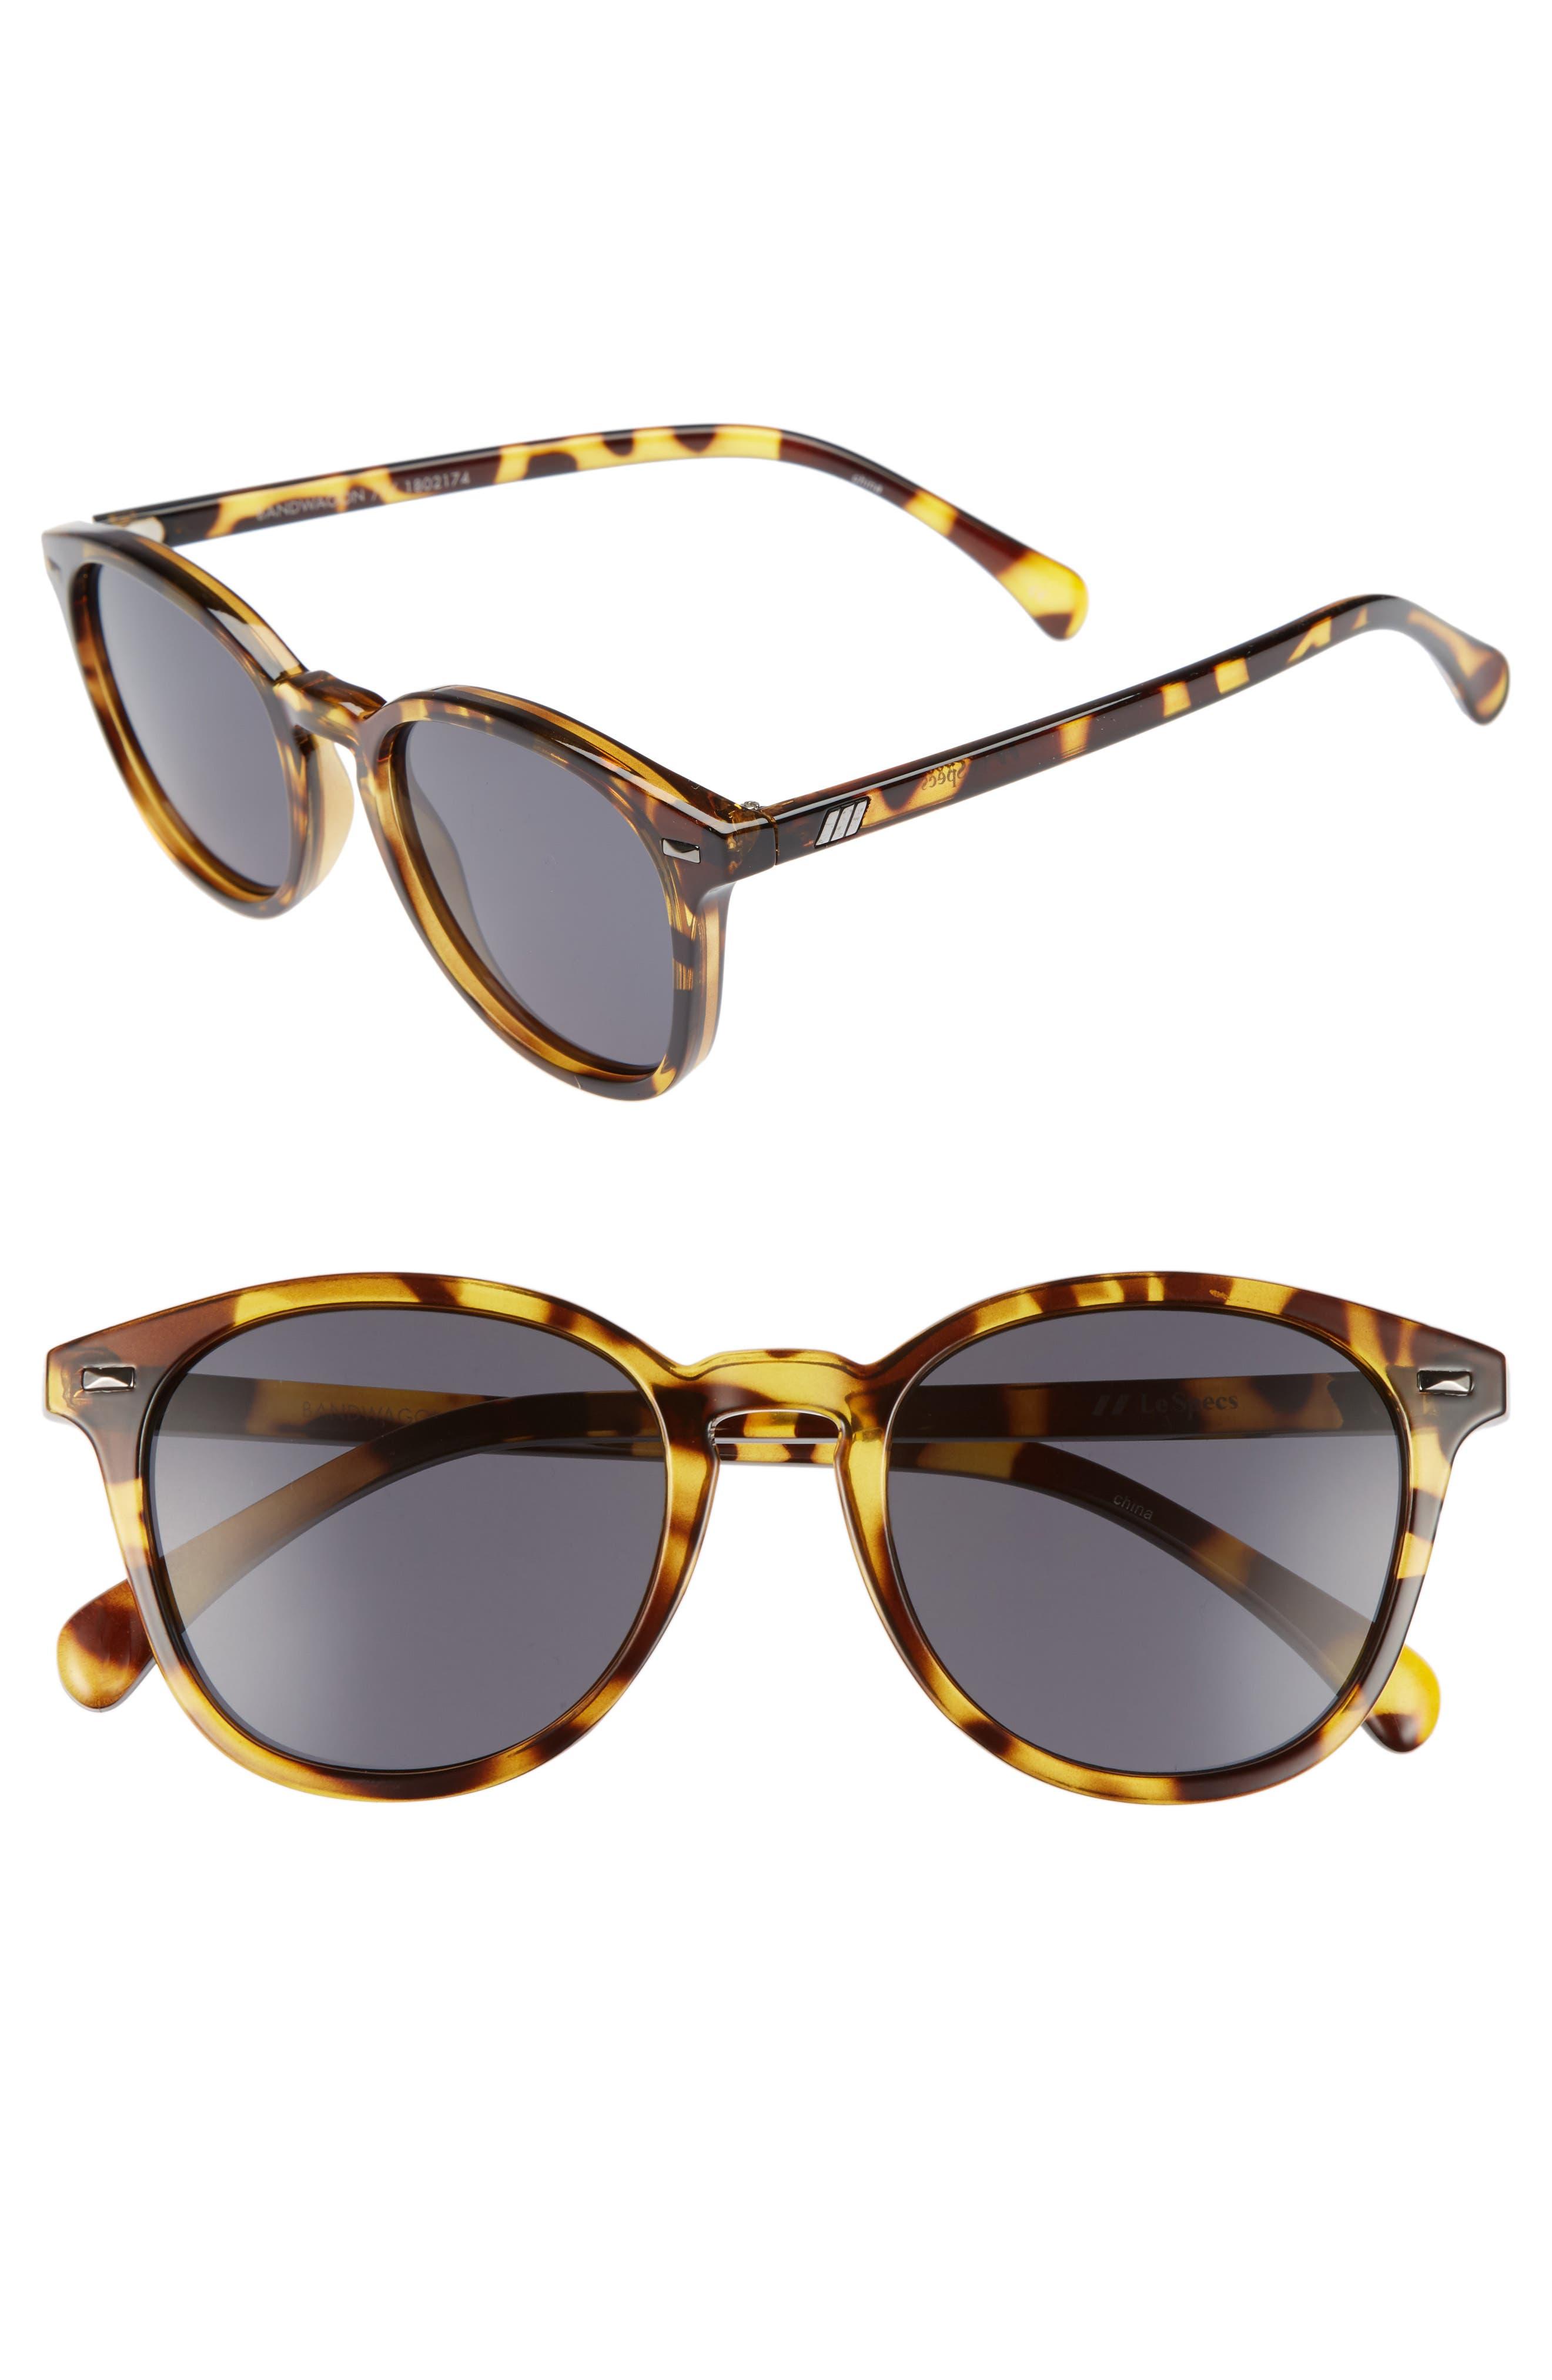 Le Specs Bandwagon 50Mm Sunglasses - Syrup Tortoise